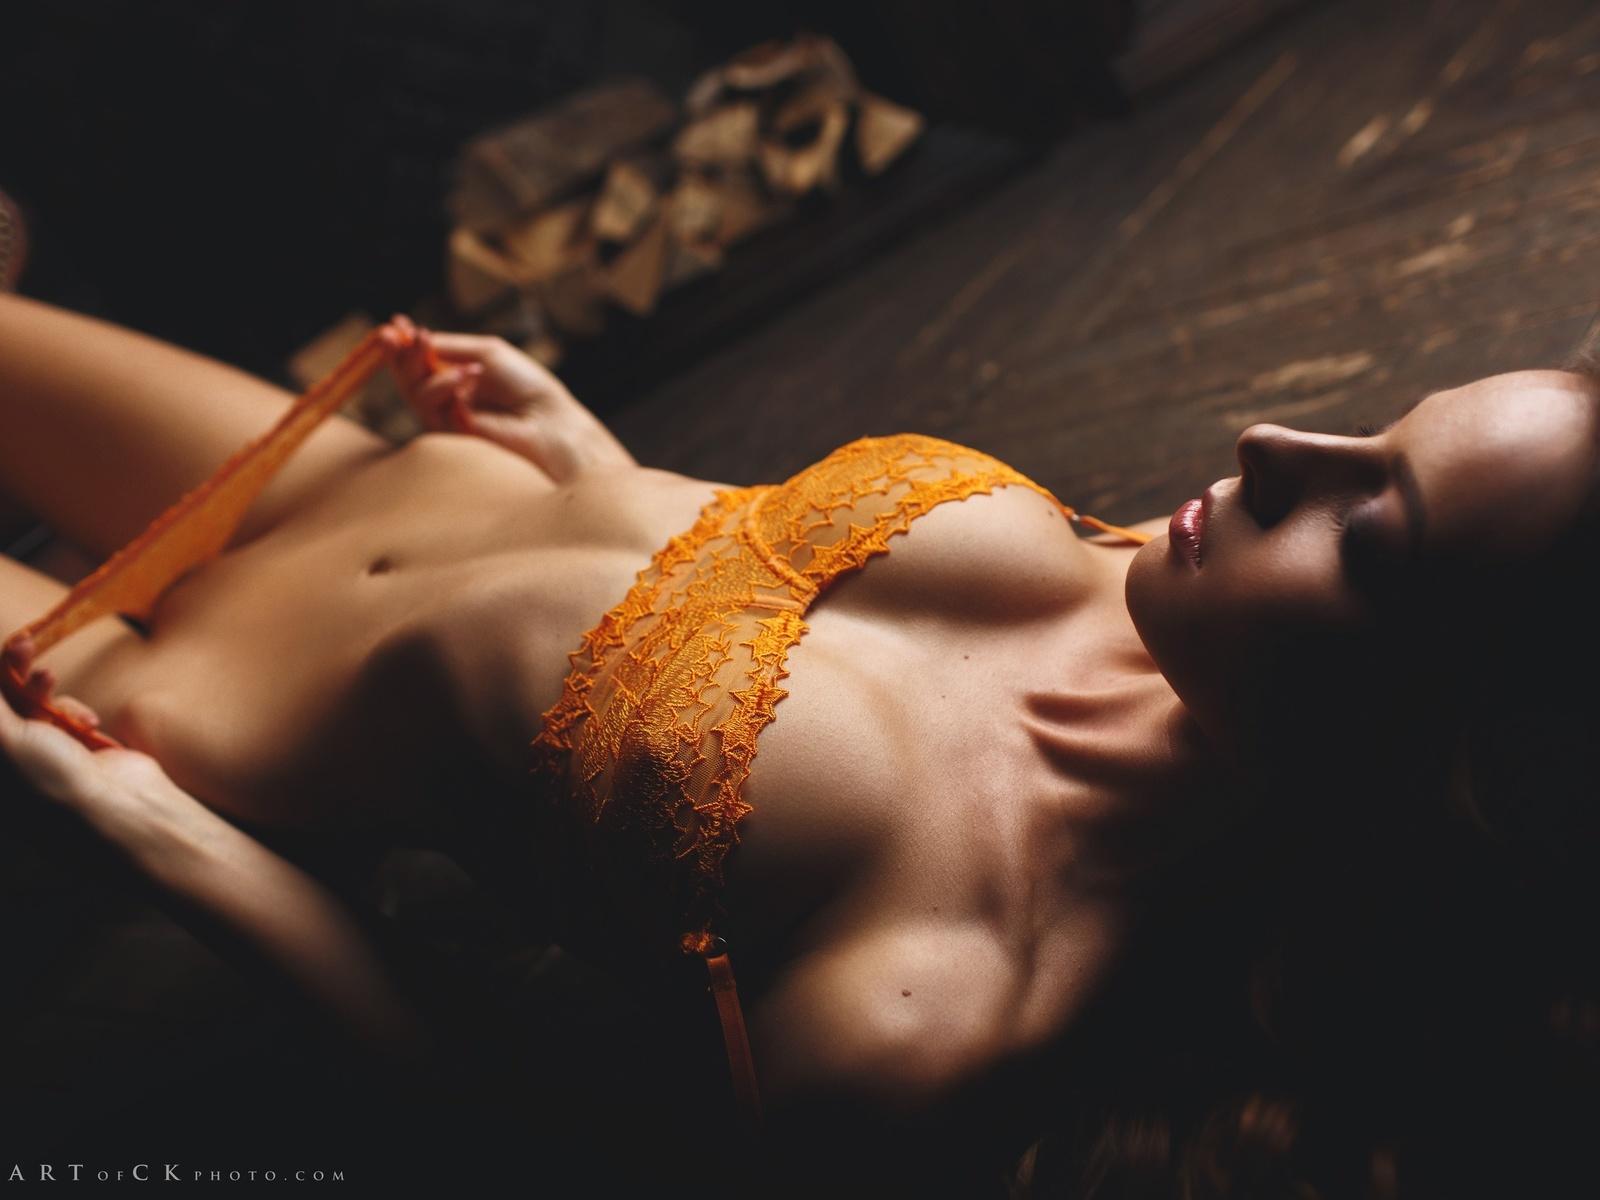 модель, девушка, поза, бельё, брюнетка, степан квардаков